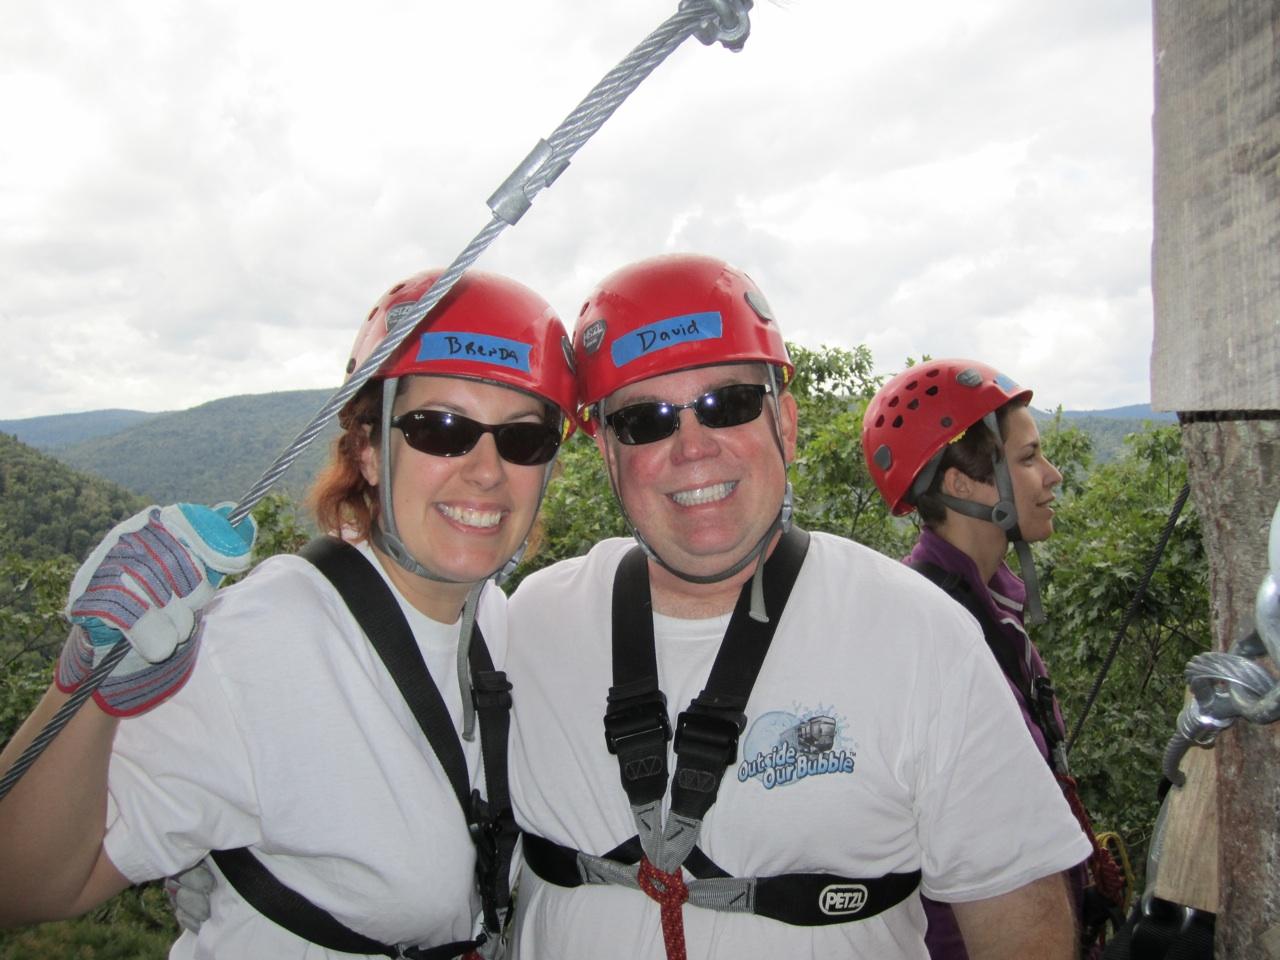 David & Brenda Zip Lining Through The Birkshire Mountains in Charlemont, Massachusetts